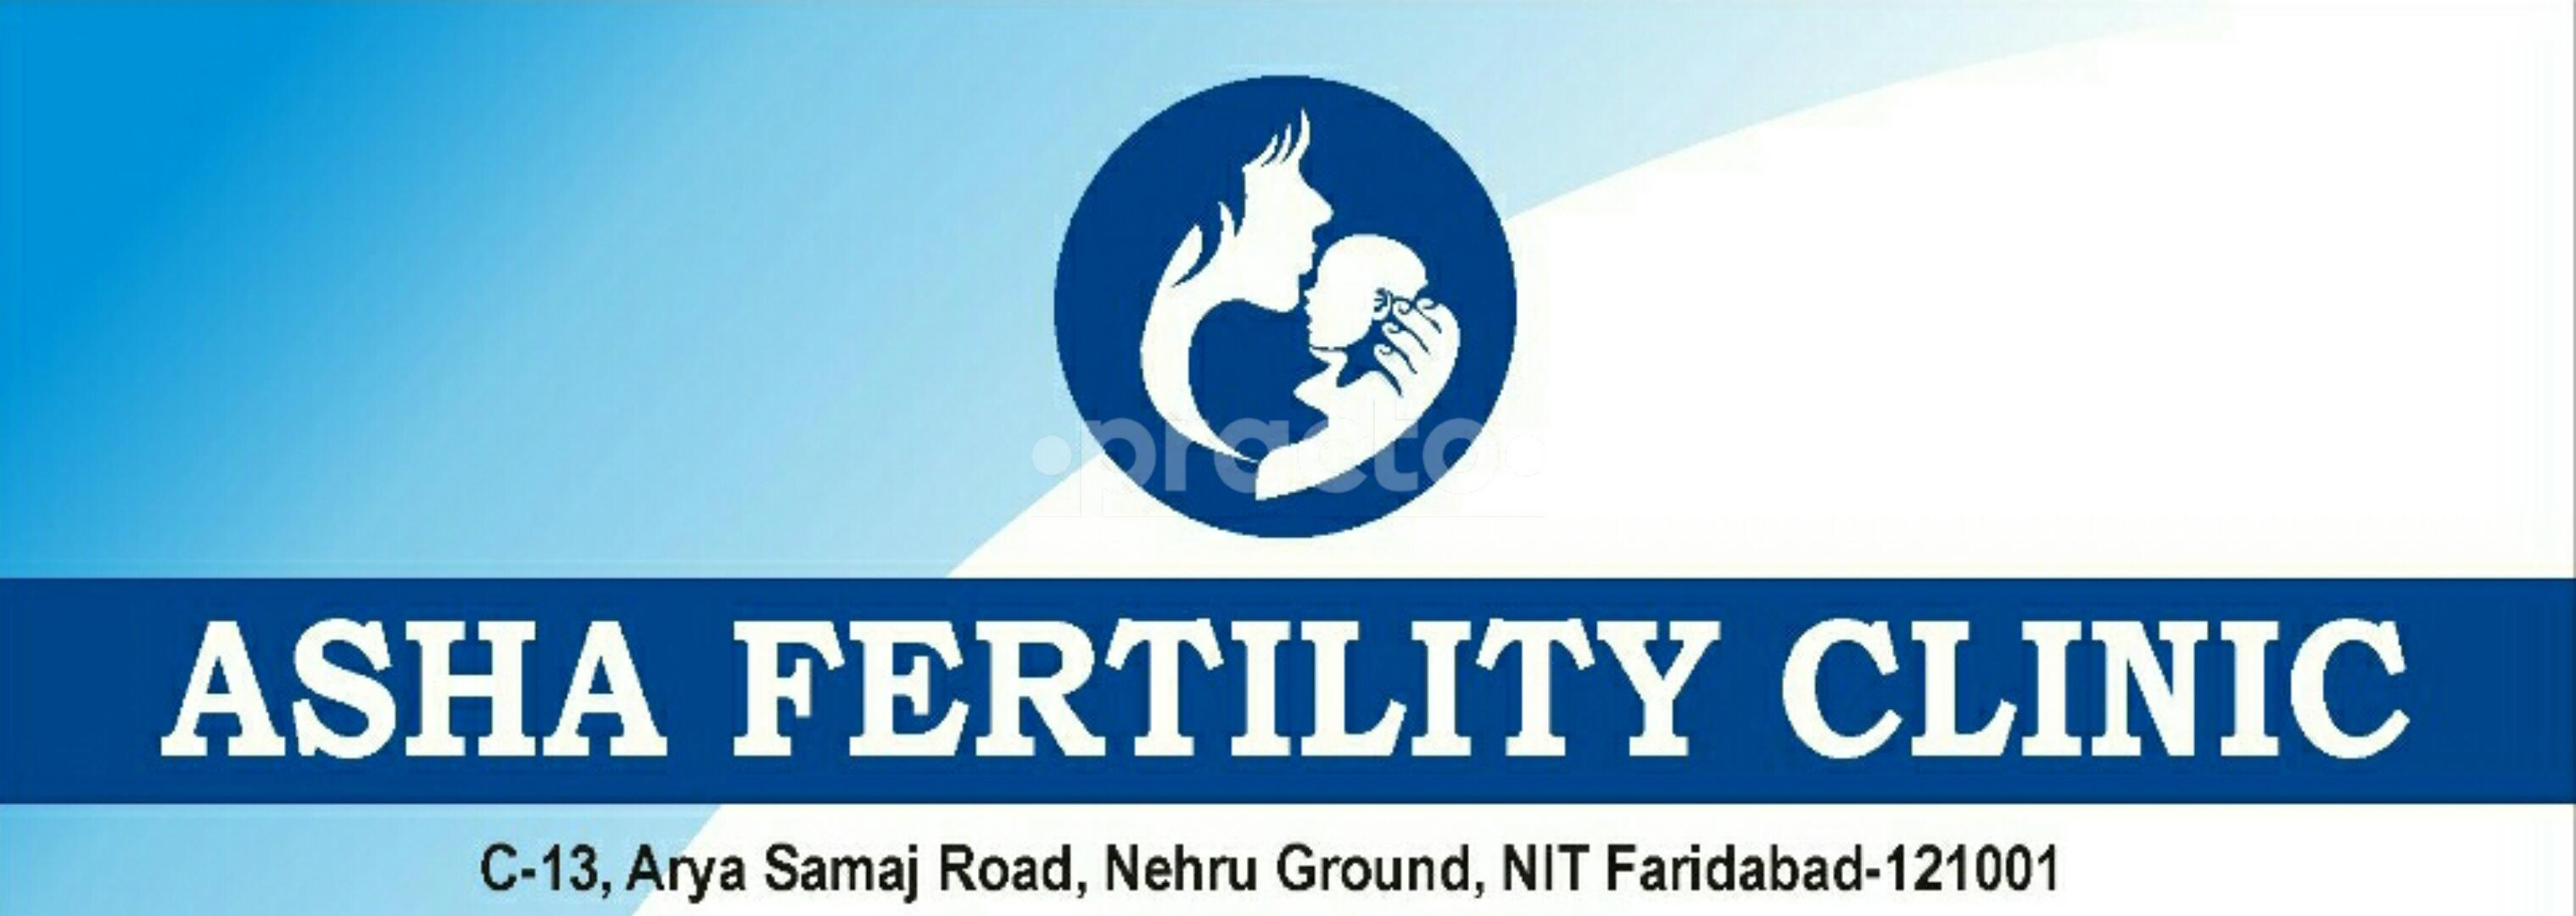 Asha fertility clinic